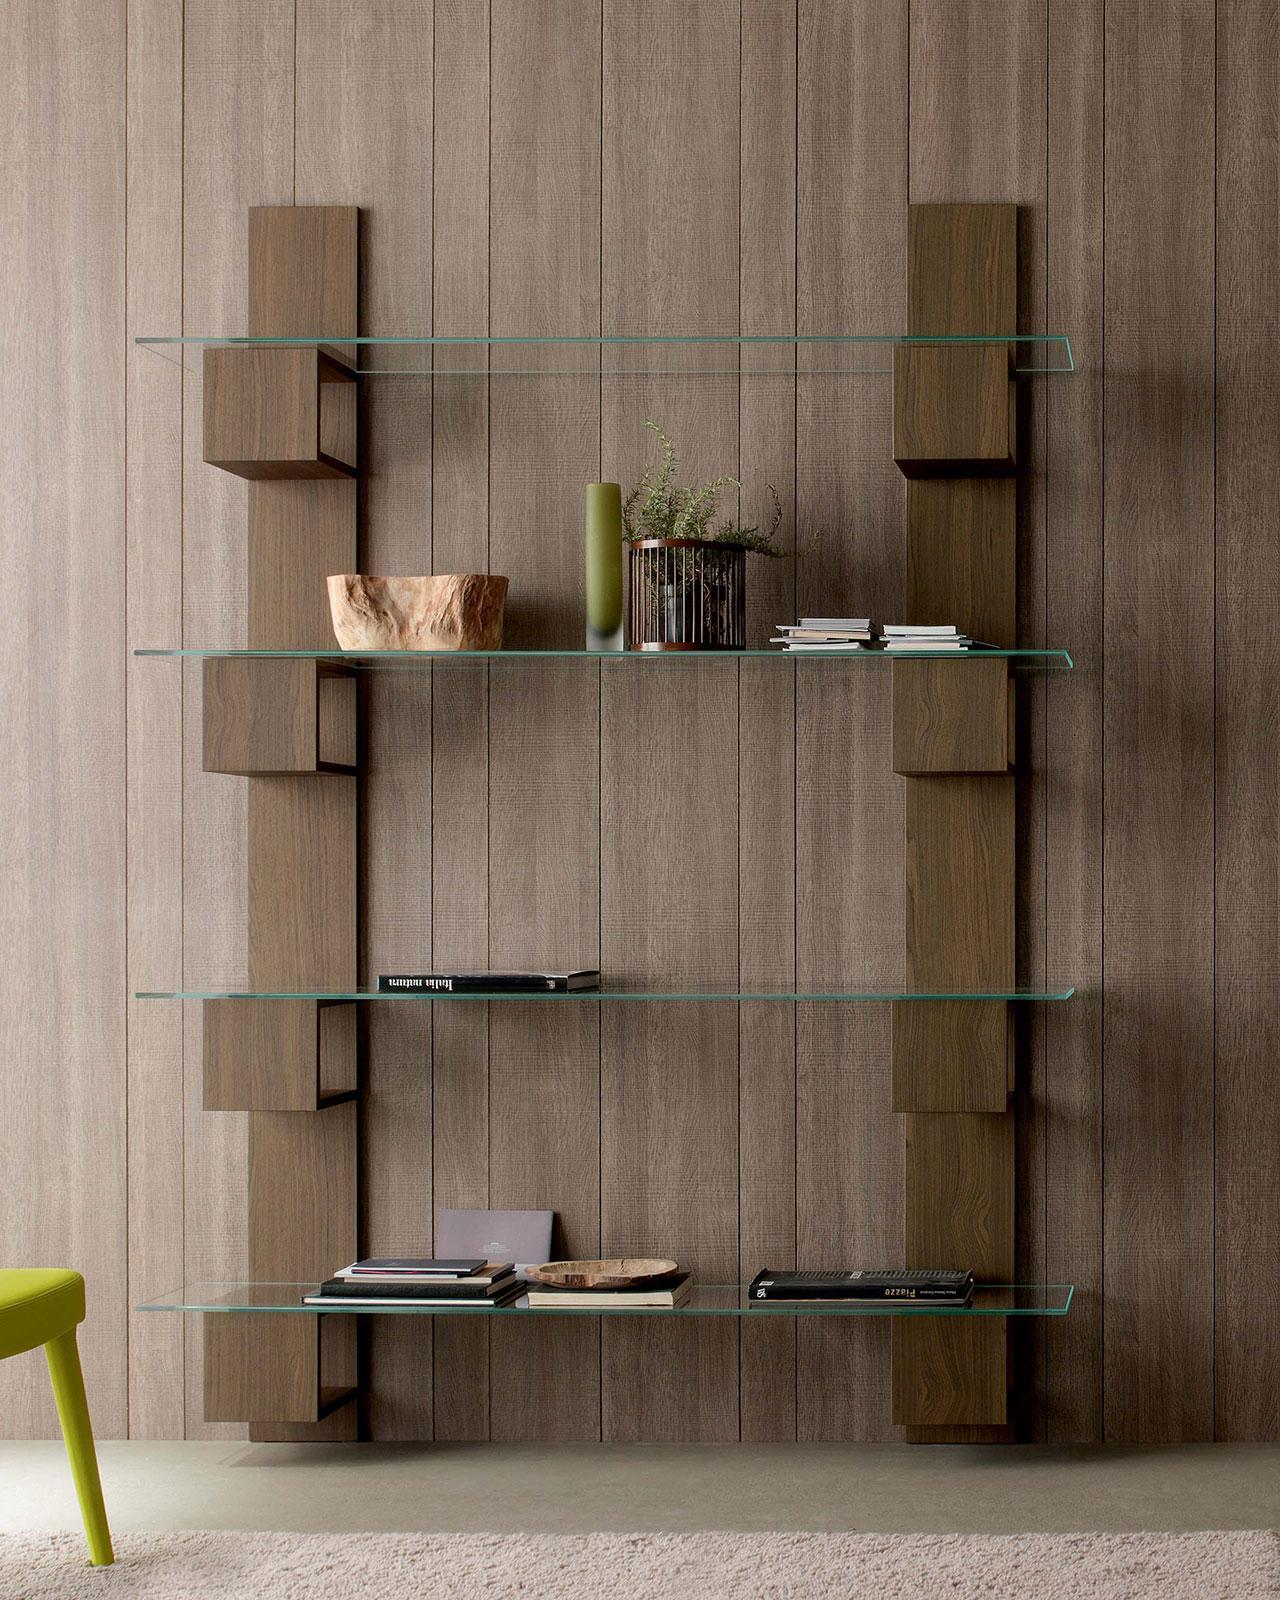 infinity biblioth que en bois et verre idd. Black Bedroom Furniture Sets. Home Design Ideas